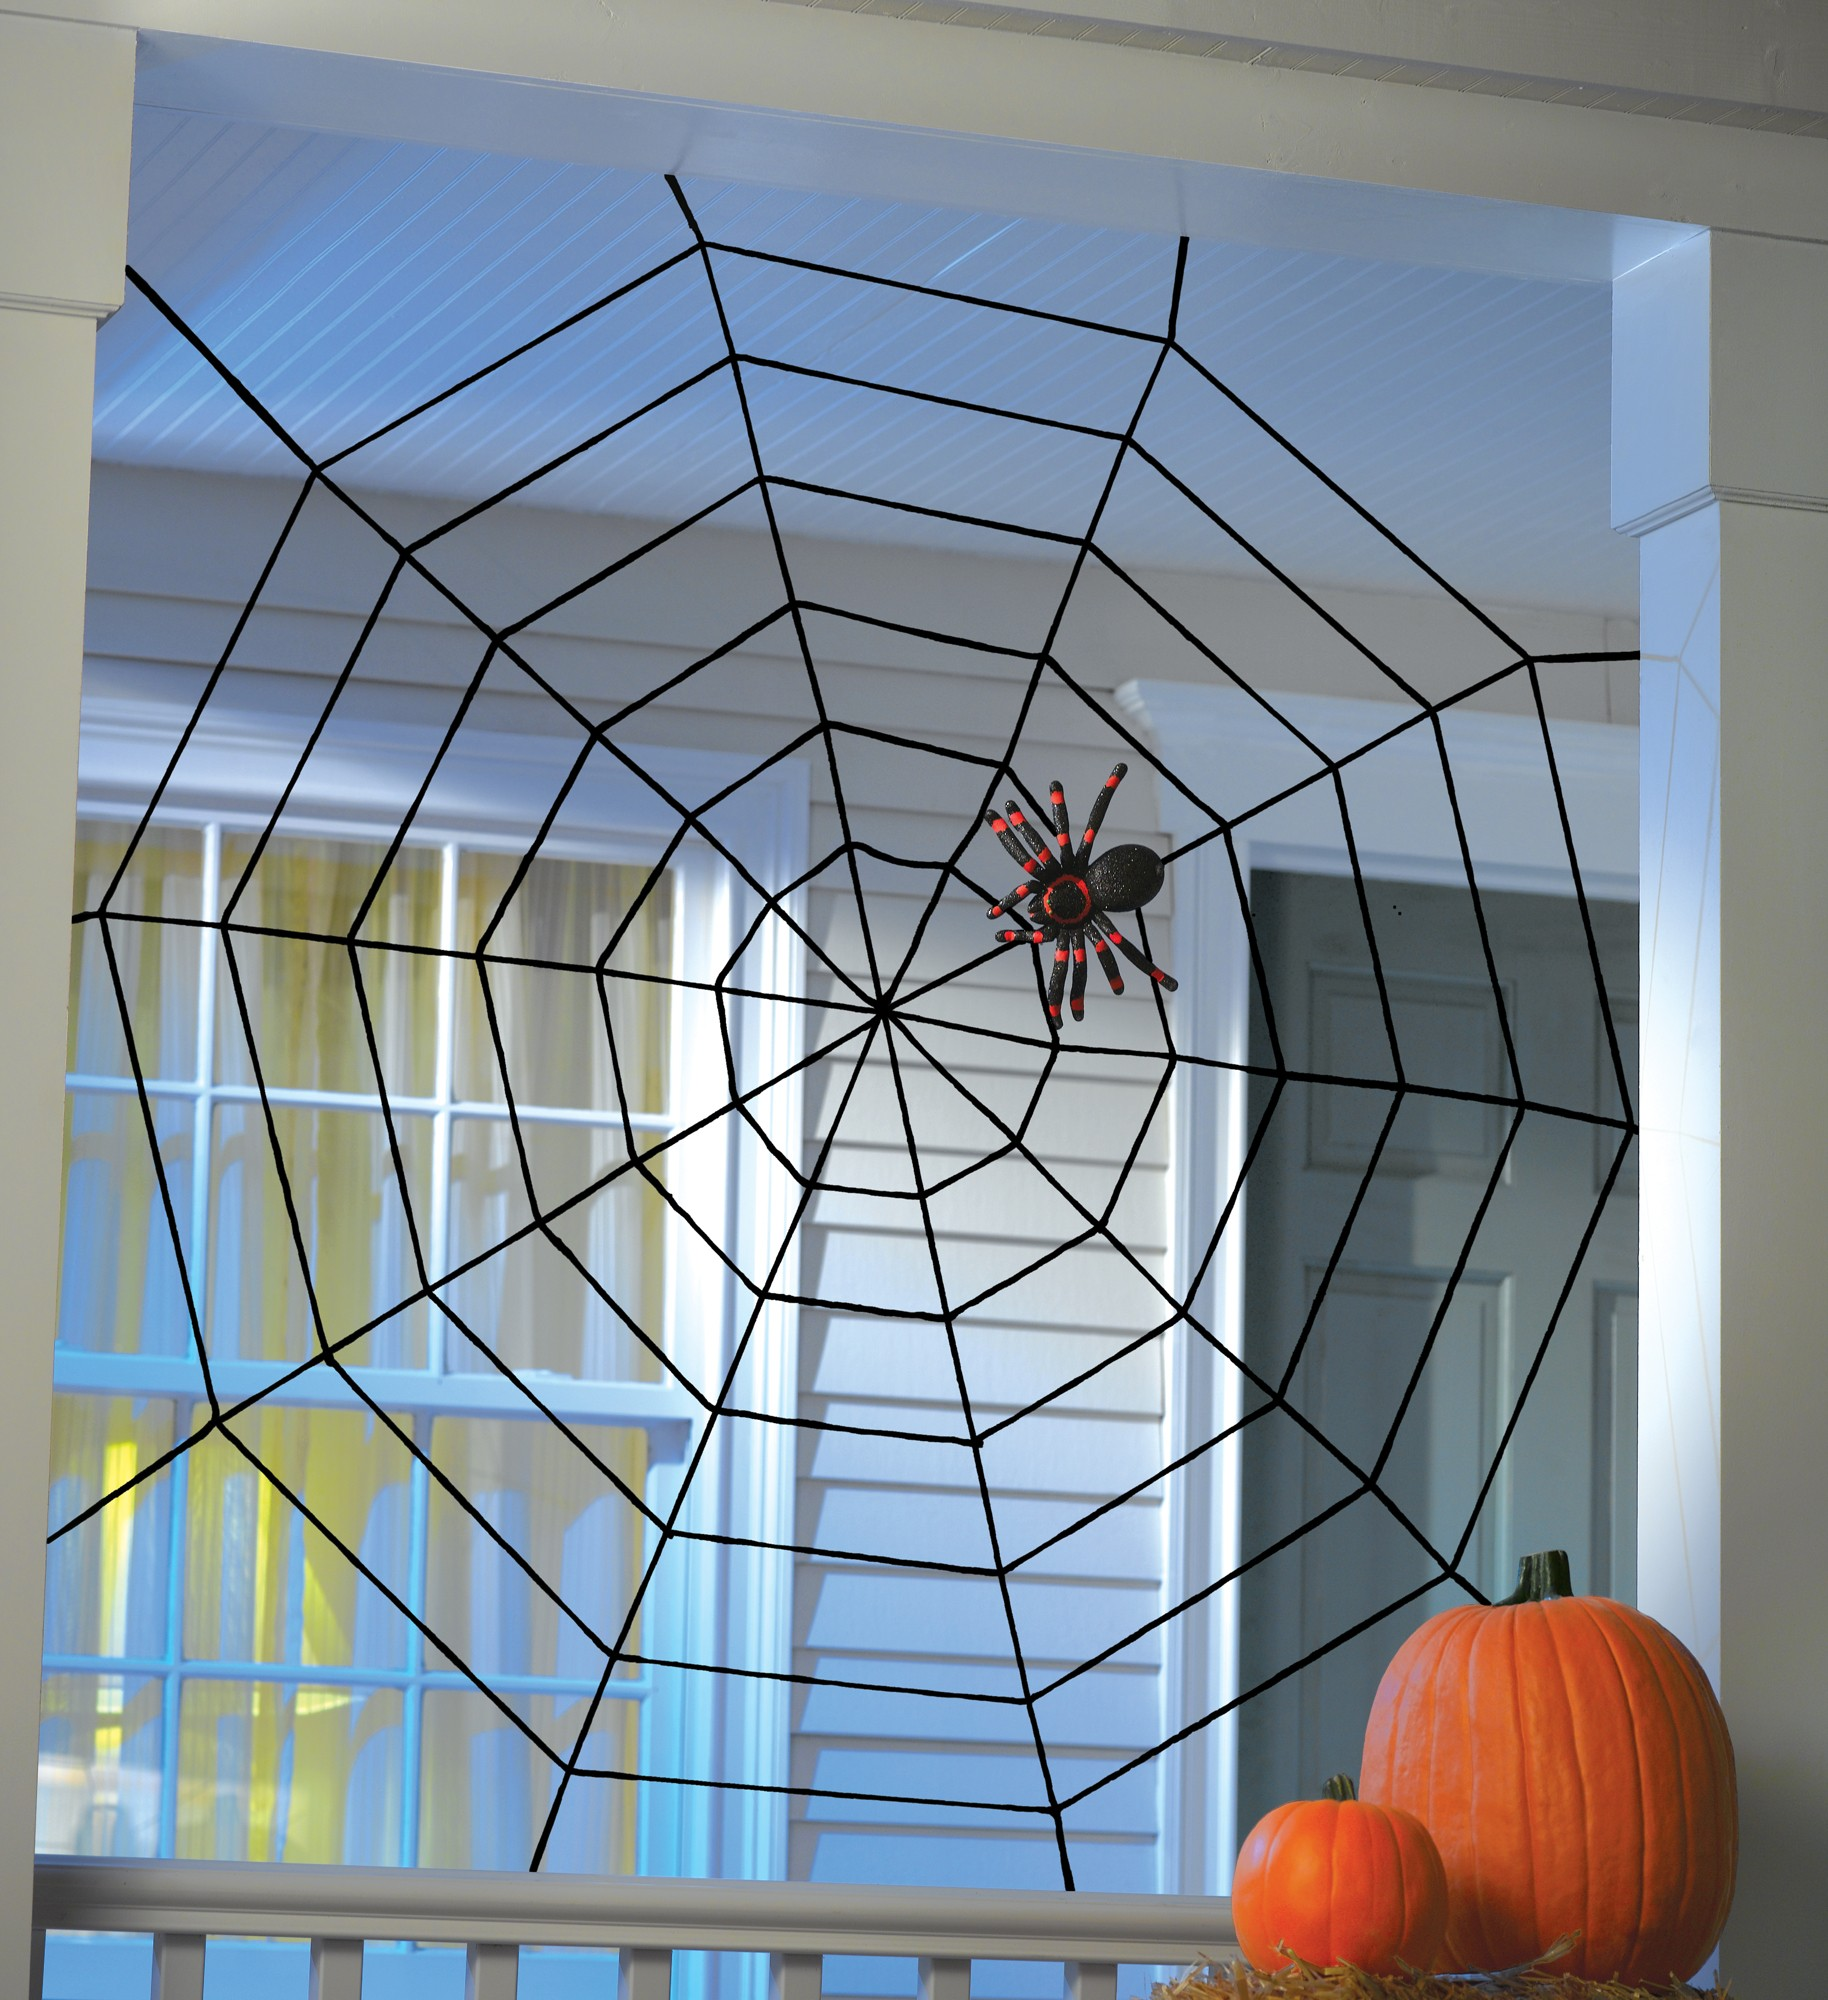 Web Decor: Black Widow Rope Spider Web Haunted House Decor Halloween